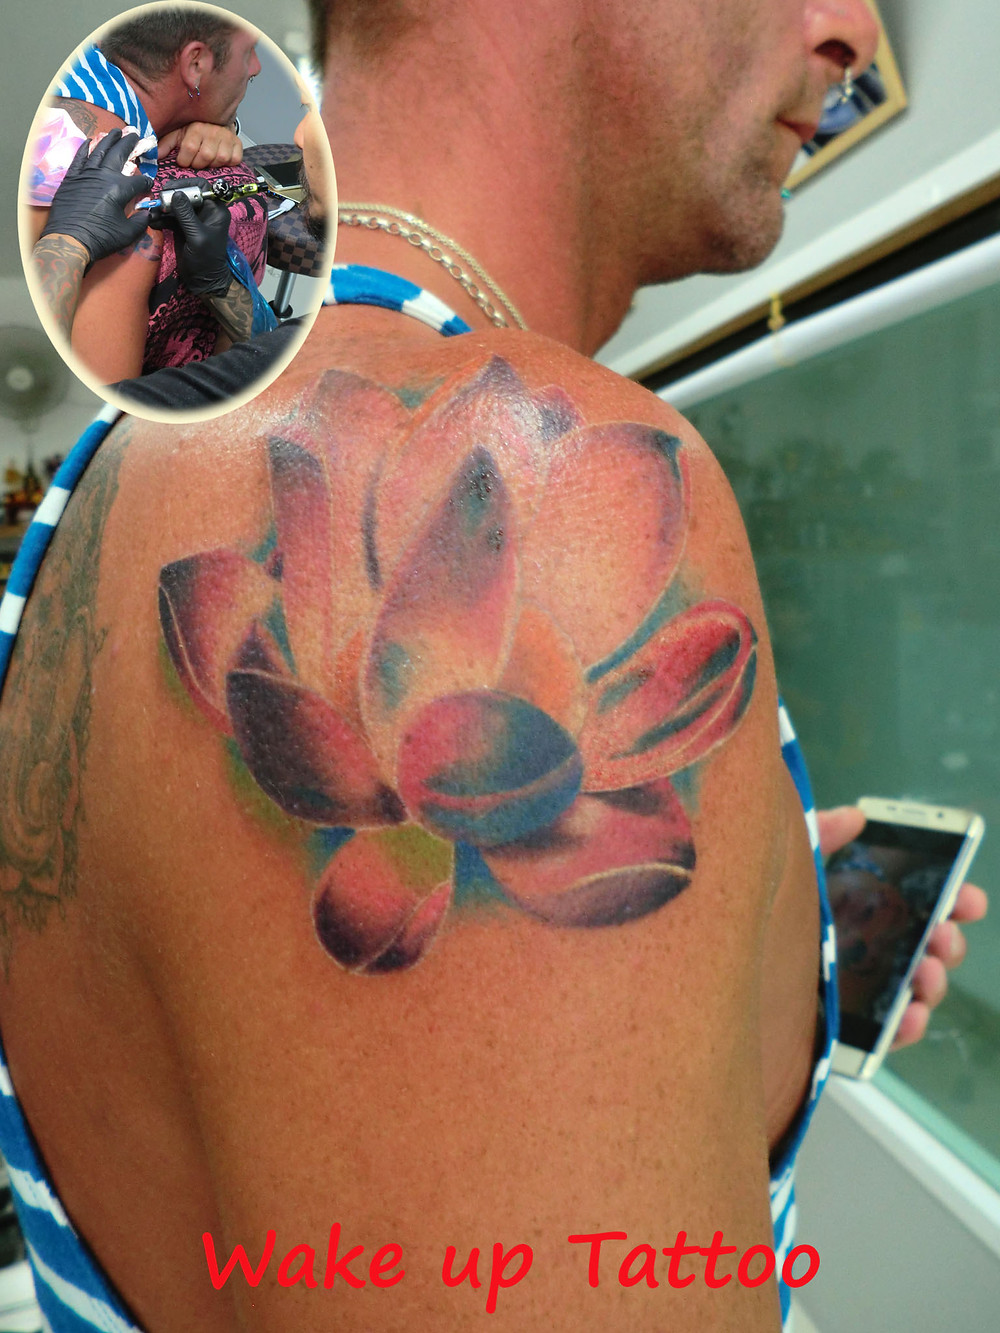 lotus tattoo by Wake up Tattoo